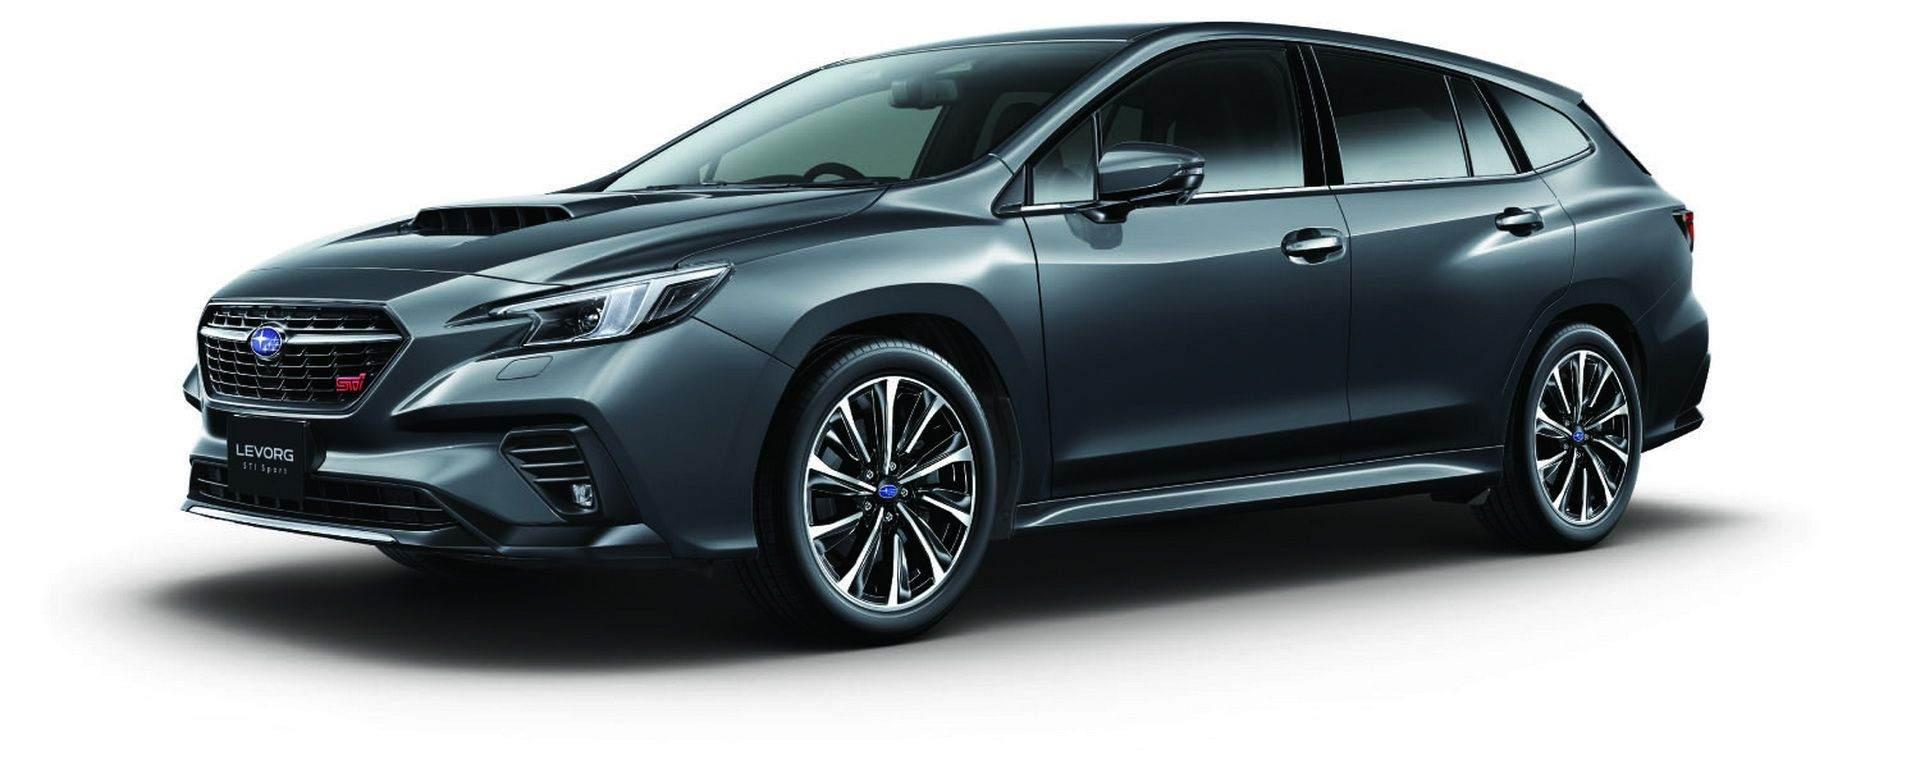 2021_Subaru_Levorg_0112